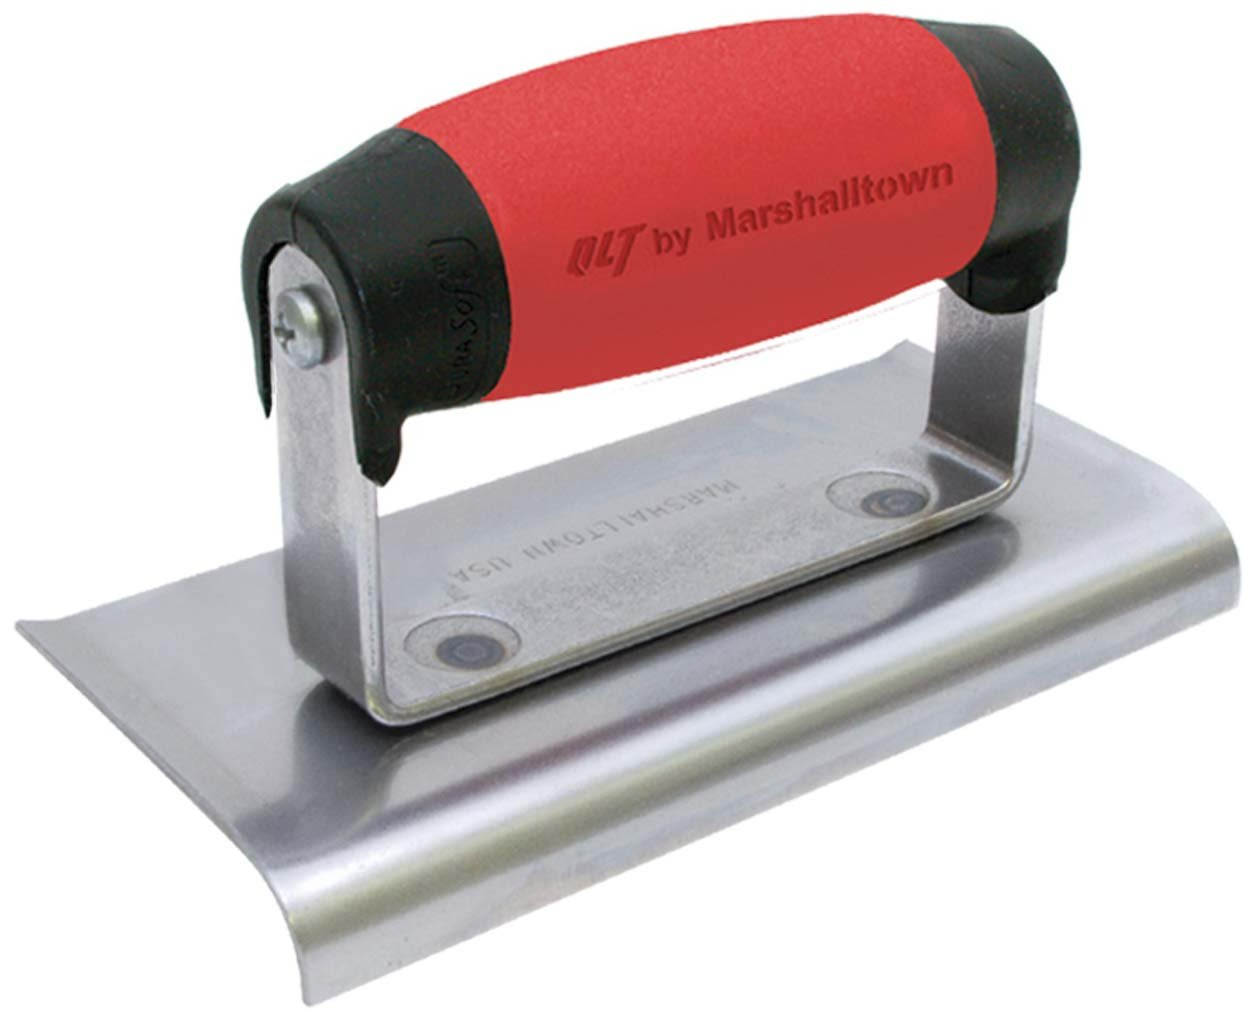 Silber Marshalltown HGSG63 6 x 3 Hand-Nutfr/äse mit SoftGrip Griff